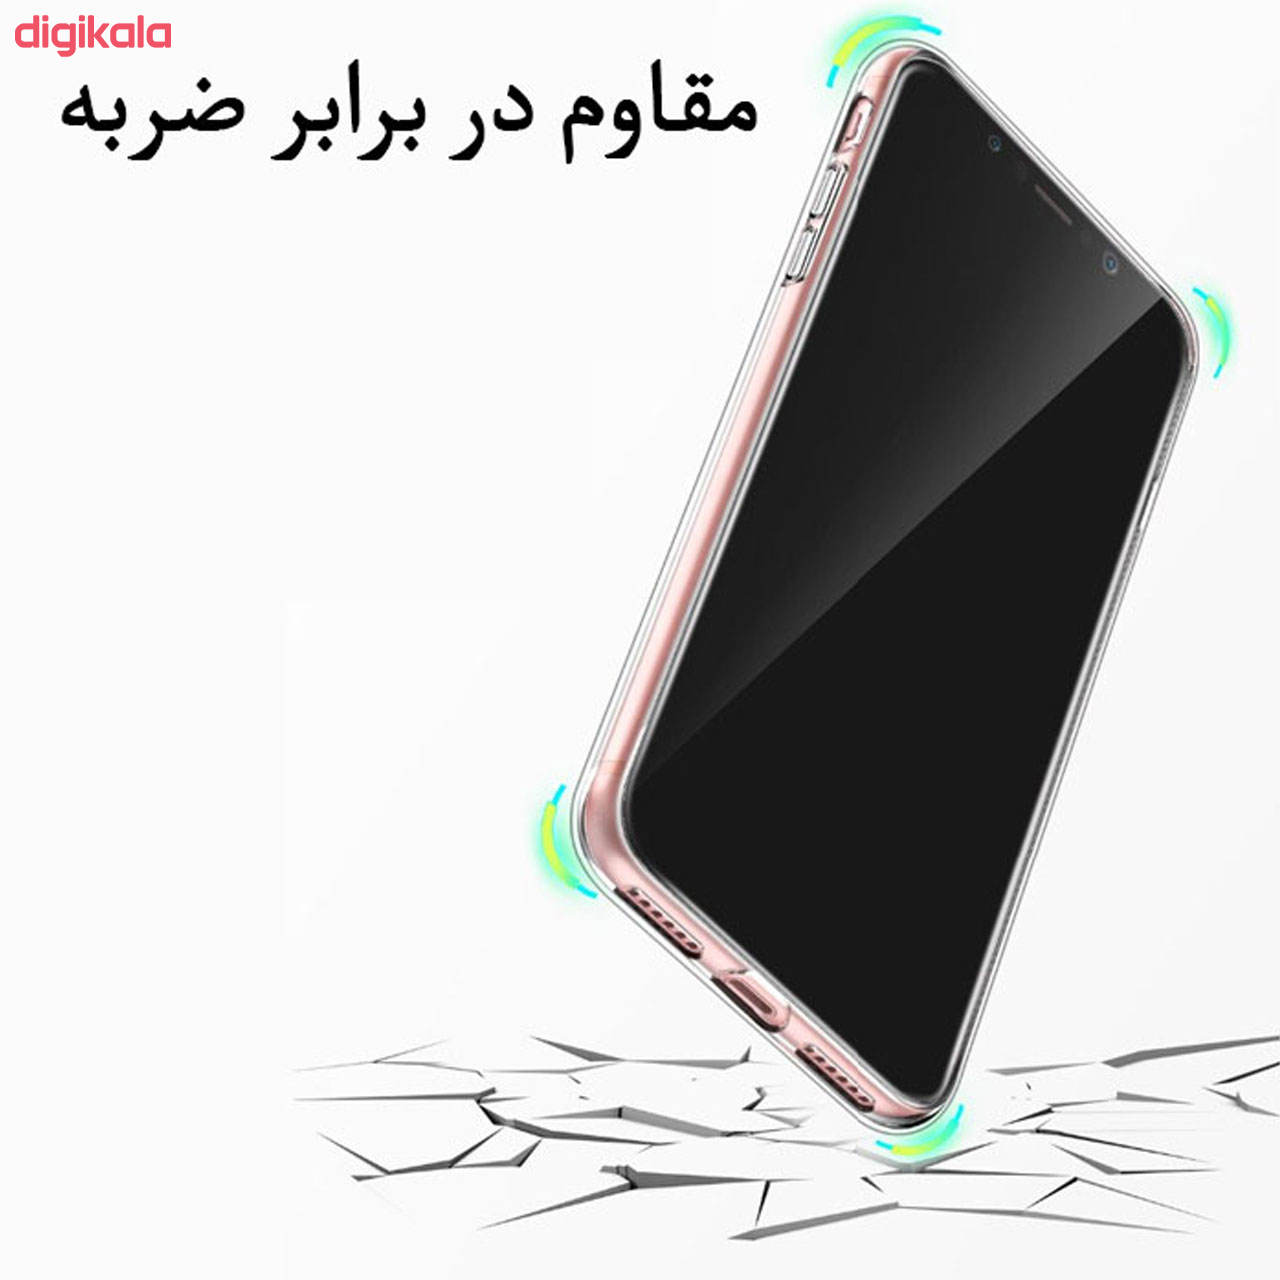 کاور مدل BLKN مناسب برای گوشی موبایل اپل iPhone XS Max main 1 7